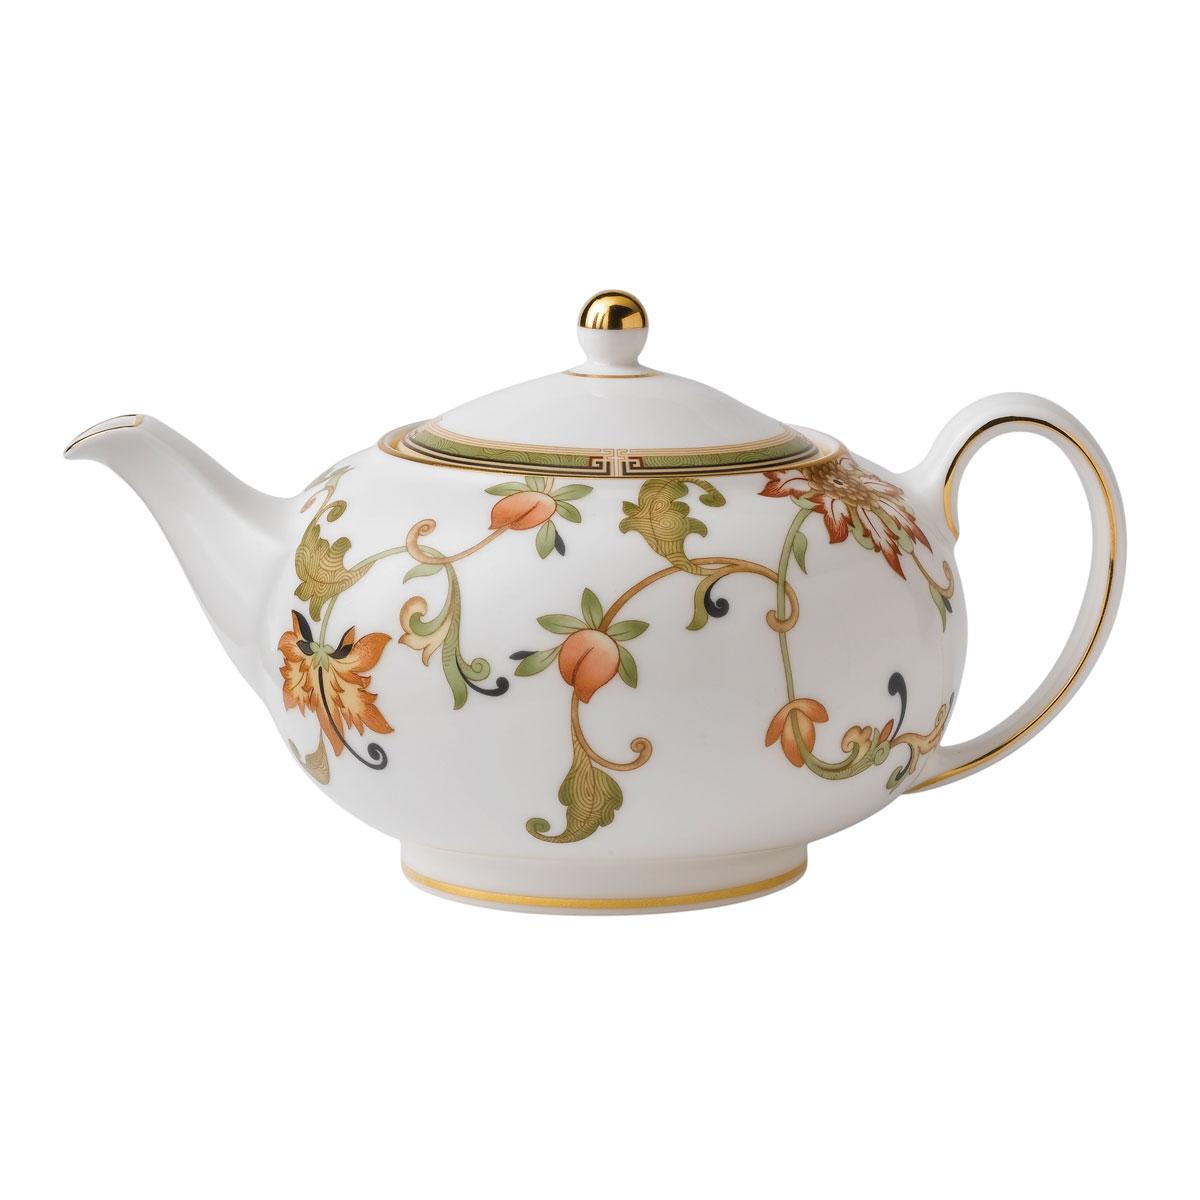 Wedgwood Oberon Teapot 1.4 Pt, 26.9oz. Flora